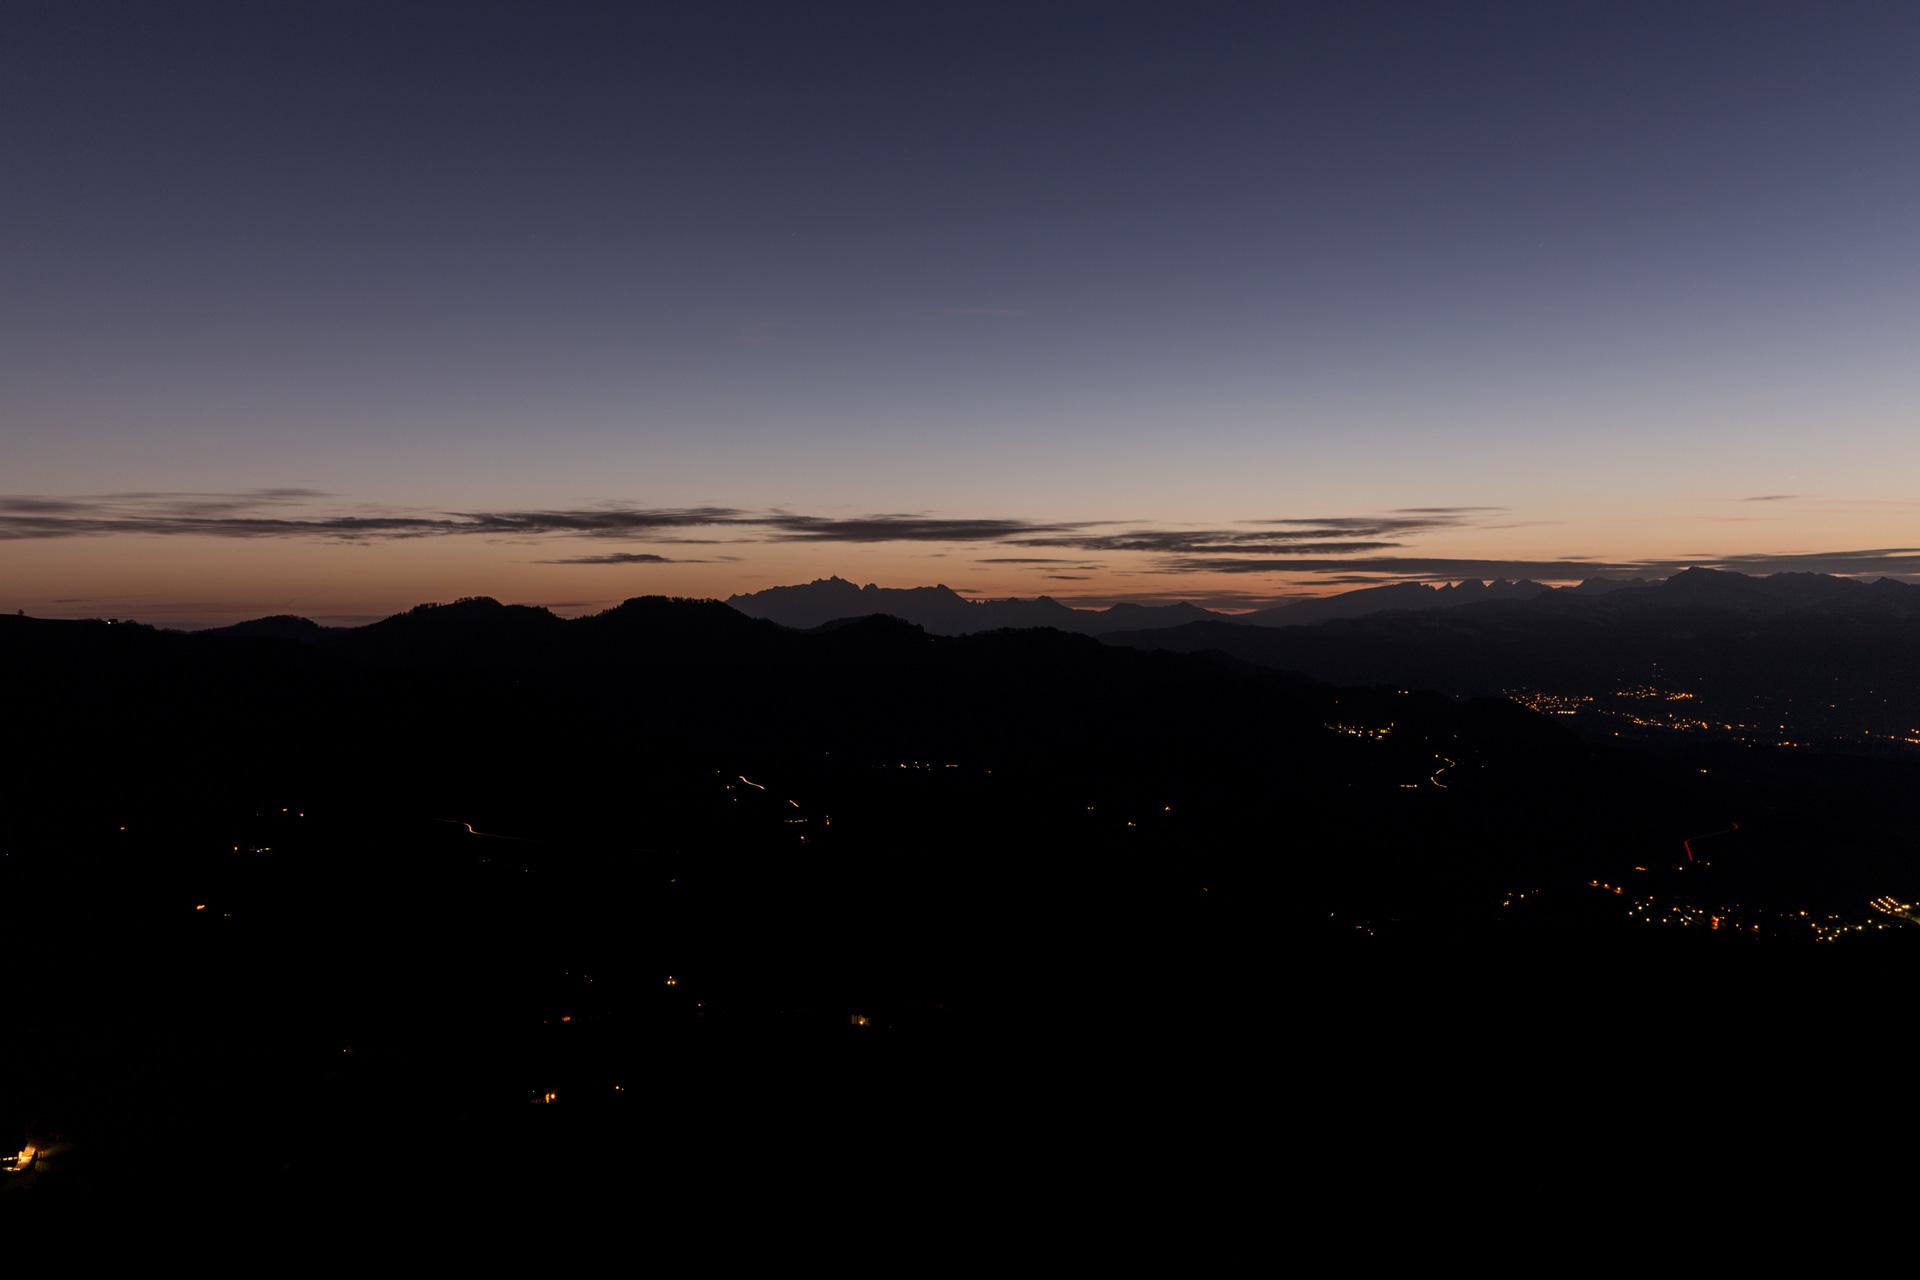 Sonnenaufgang-Bachtelturm_20151219_5816-1